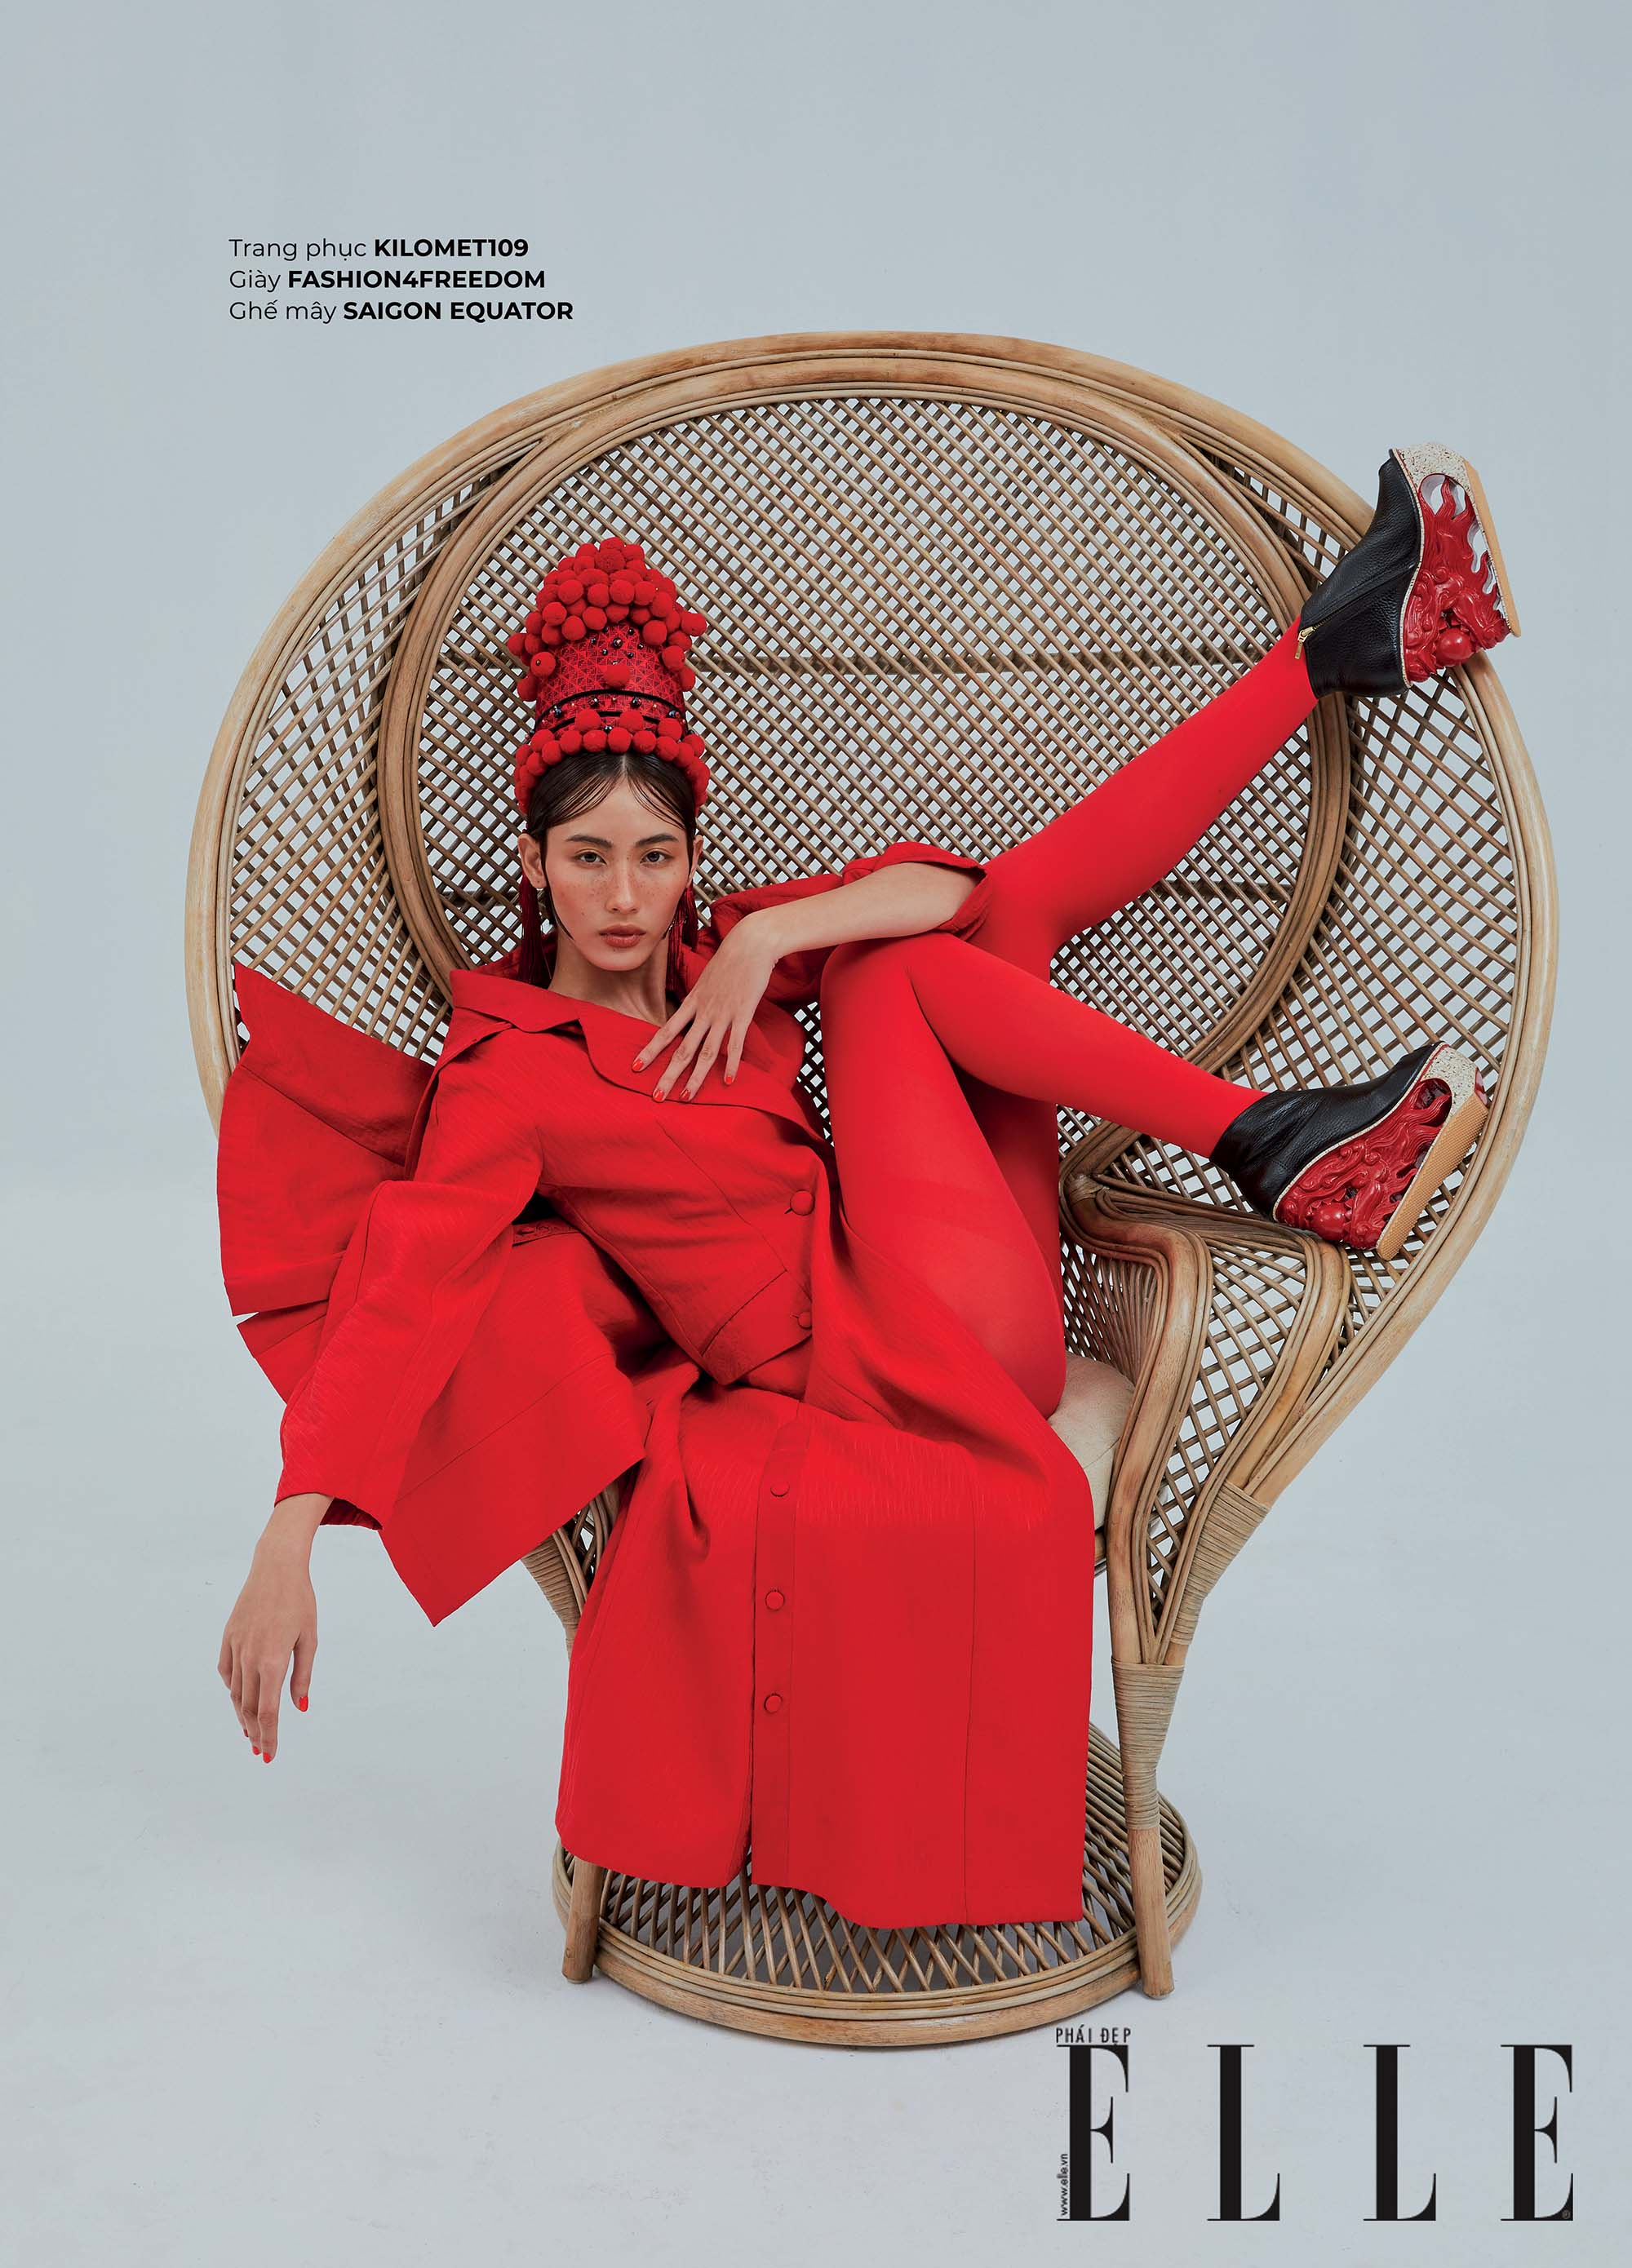 bộ ảnh thời trang trang phục Kilomet109